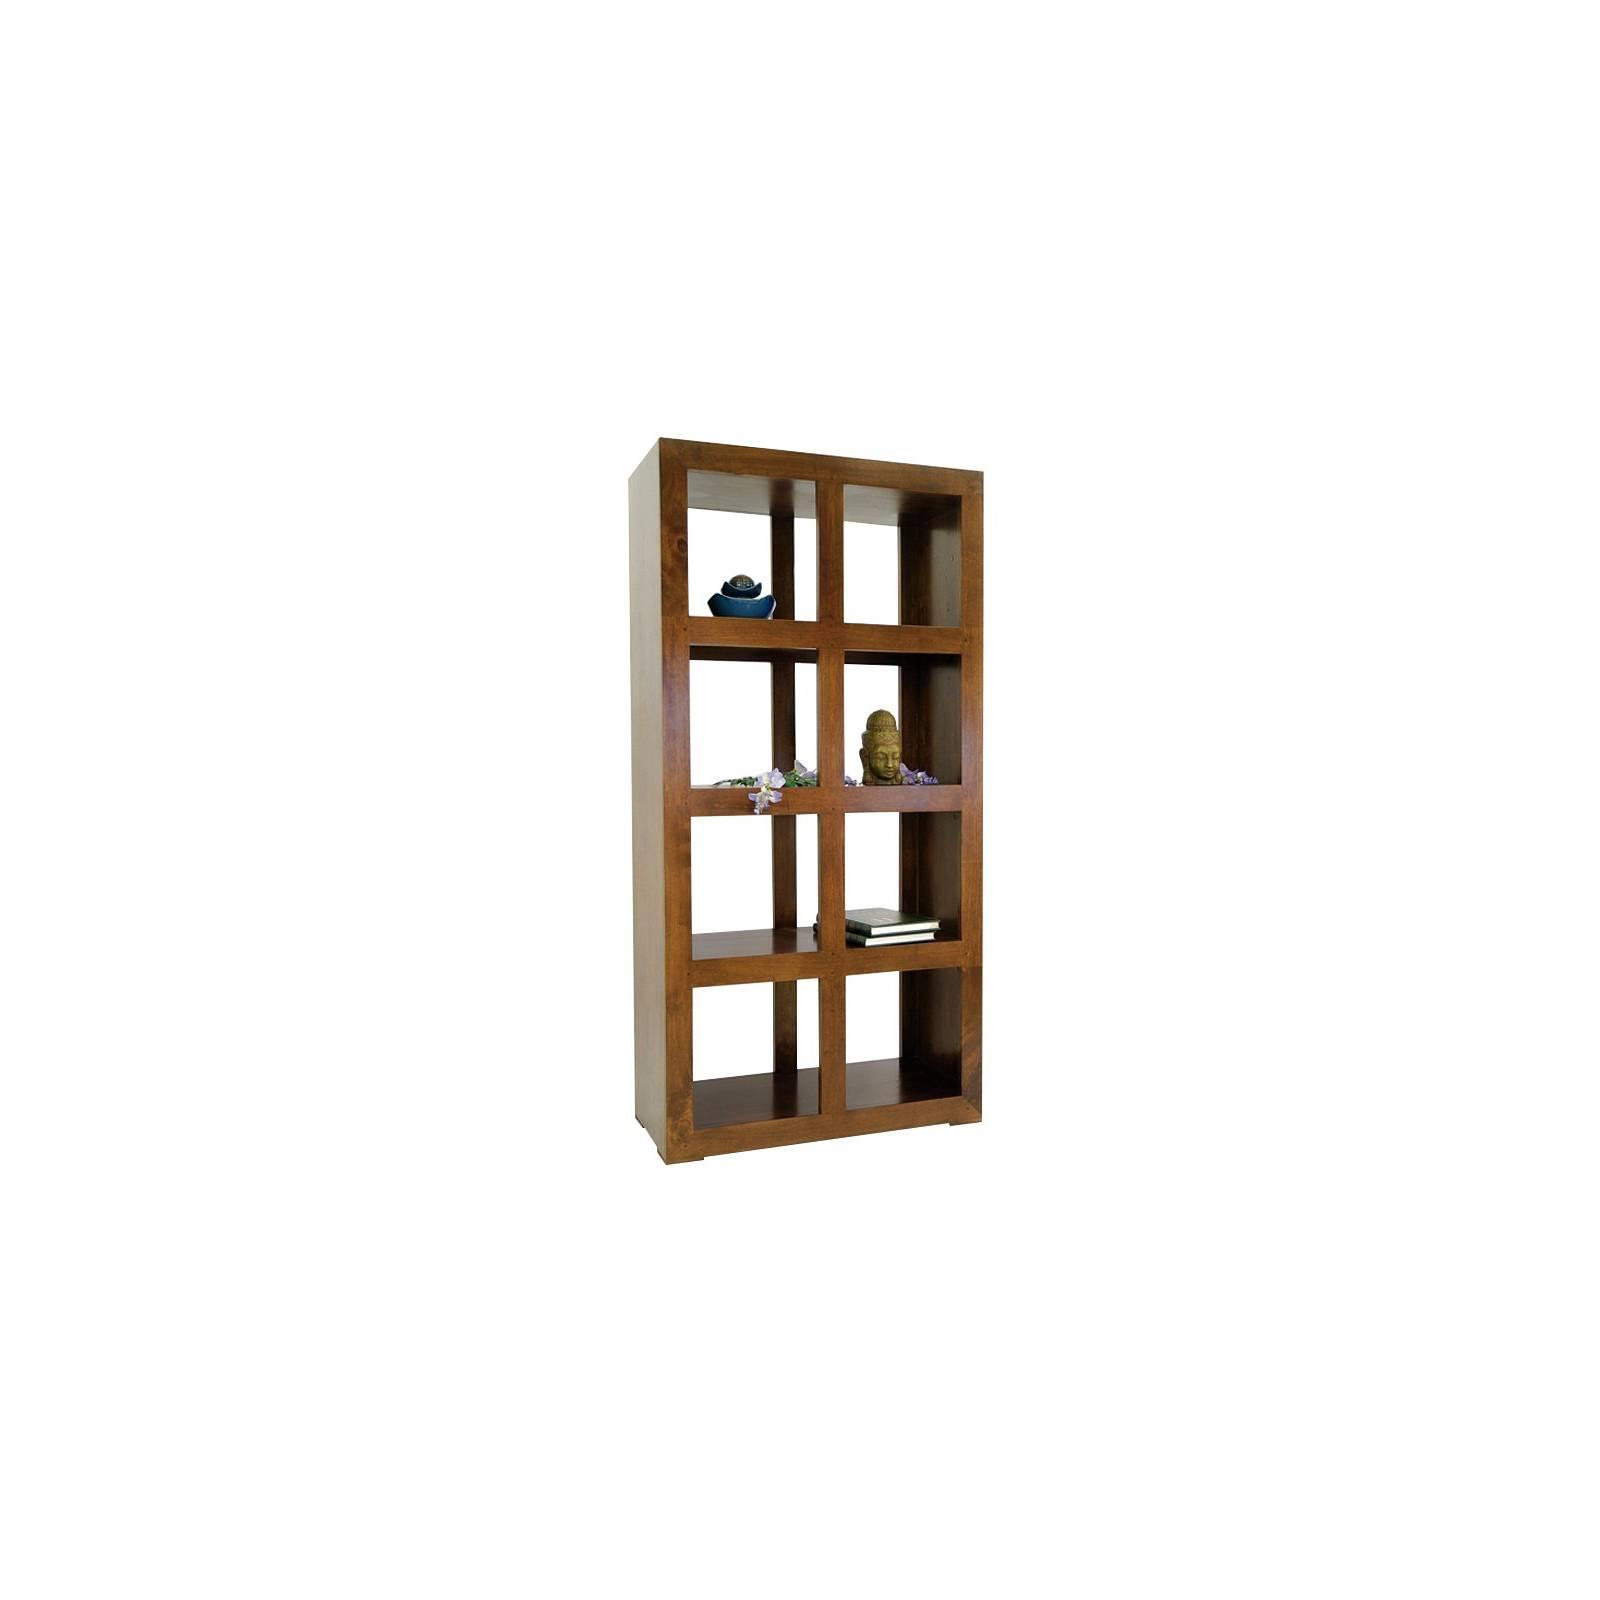 Bibliothèque Omega Hévéa - meuble style design